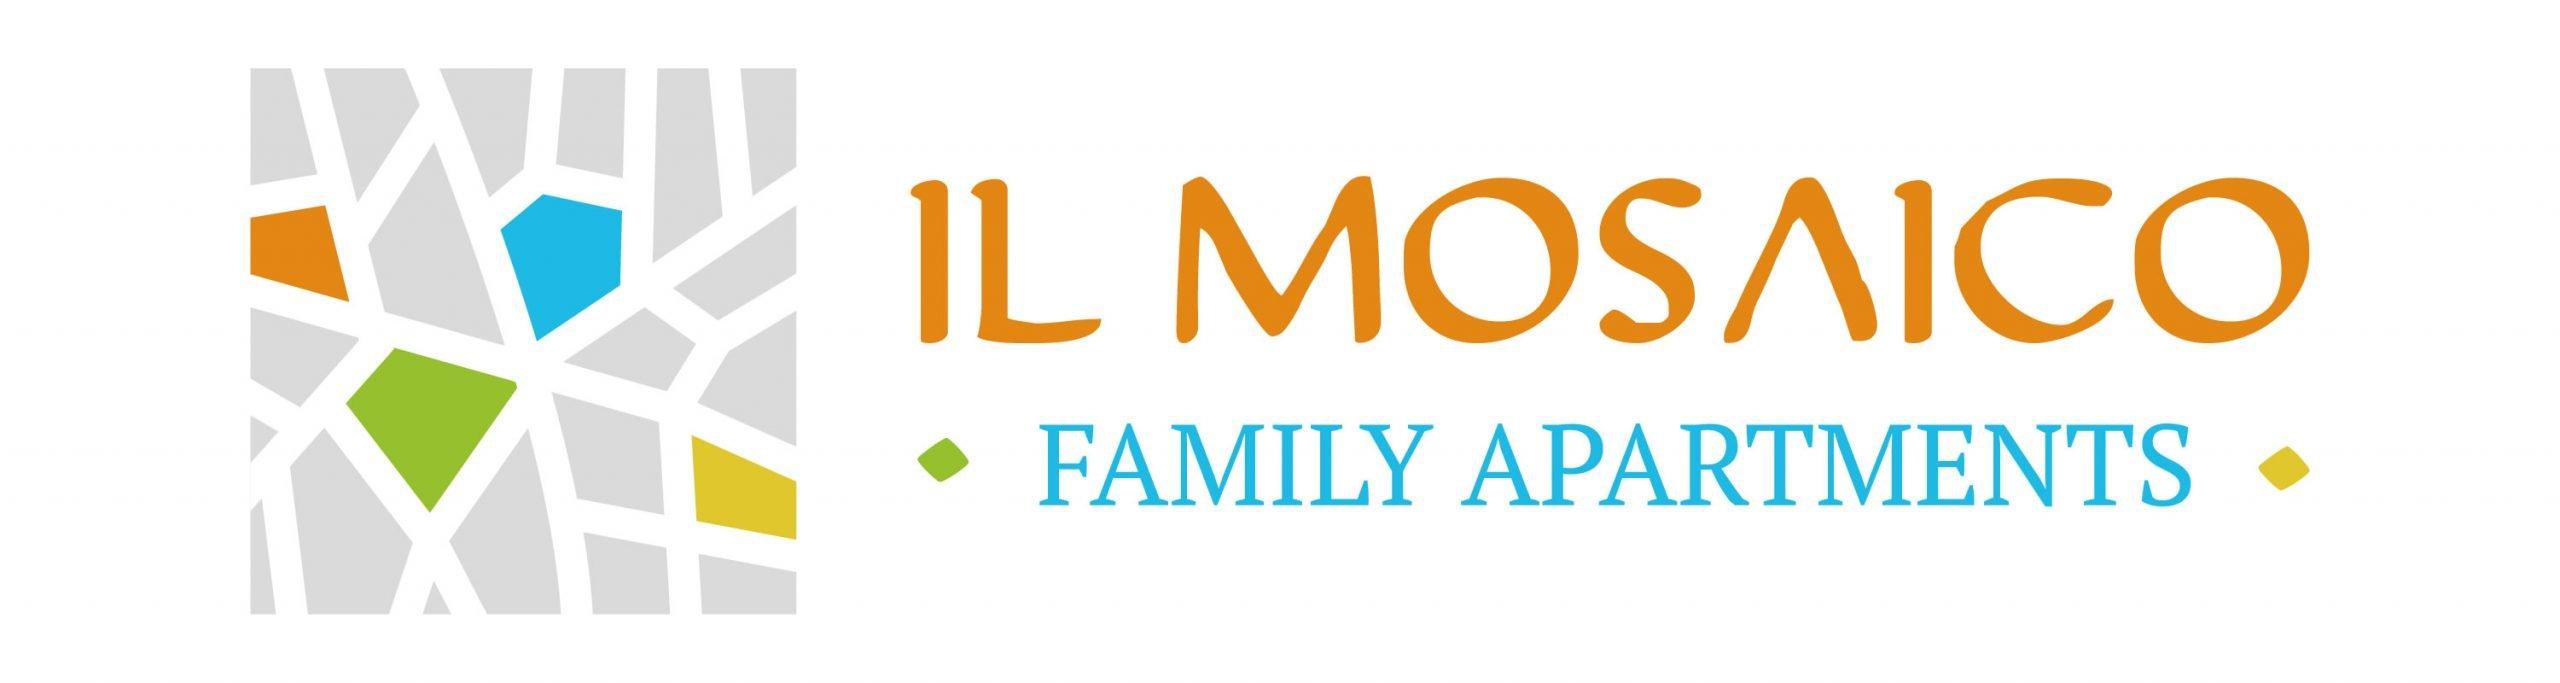 Il Mosaico Family Apartments Logo